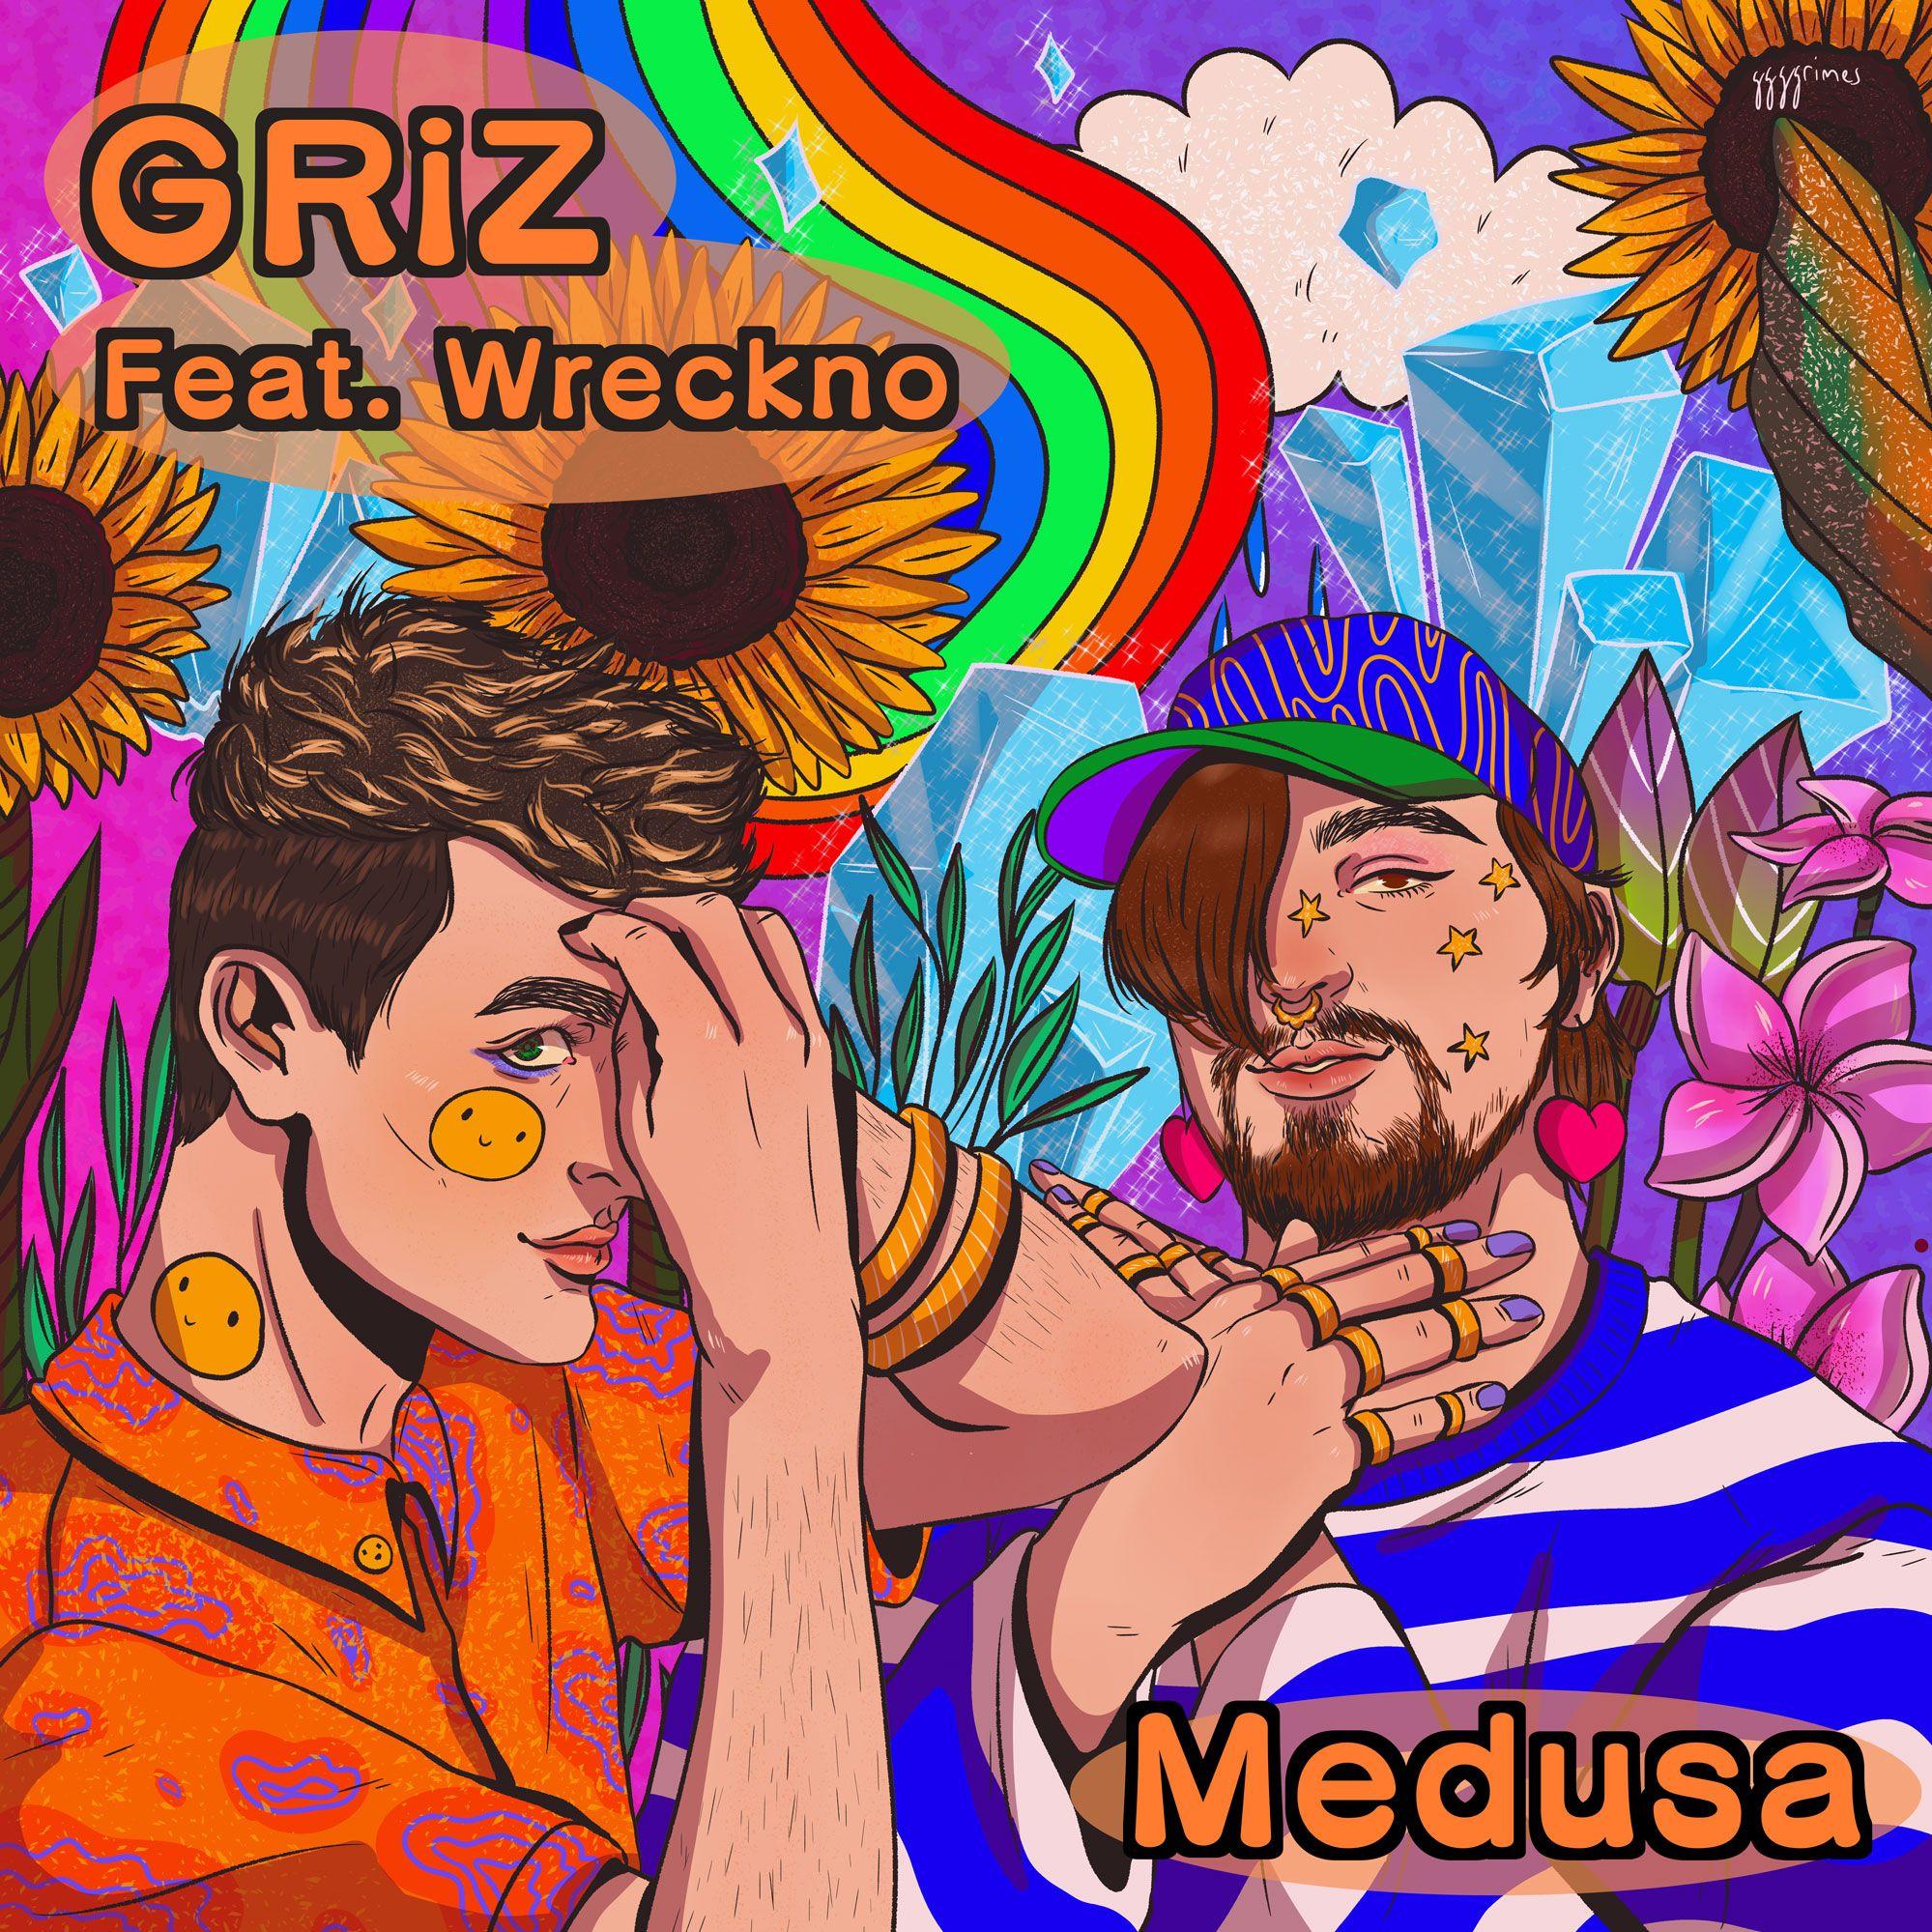 GRiZ - Medusa (feat. Wreckno)